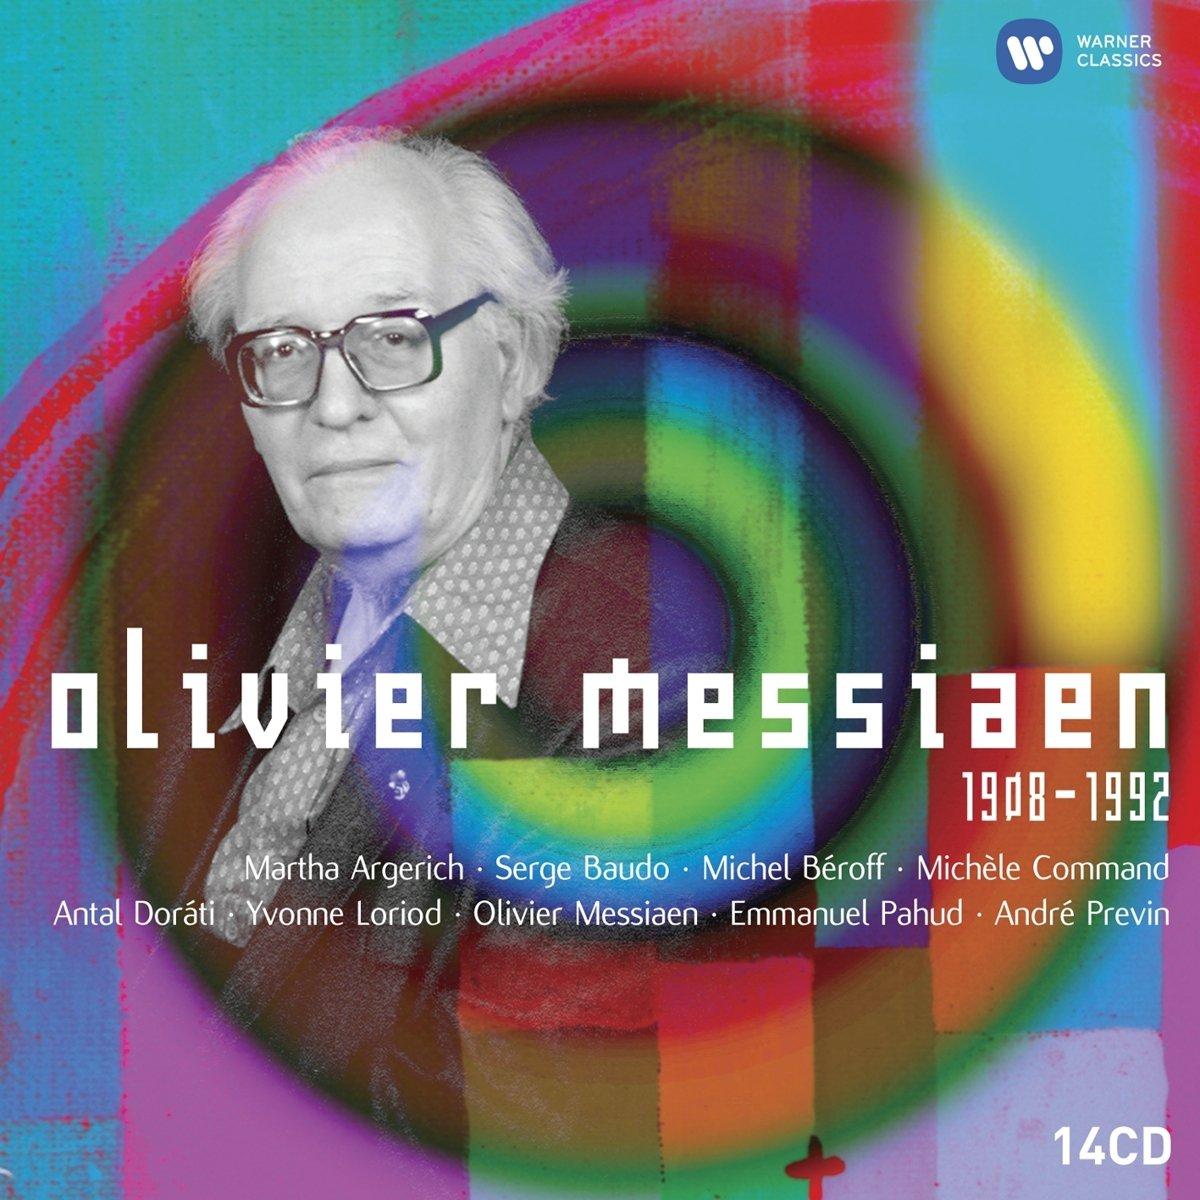 Mesa Mall Messiaen The Anniversary Max 87% OFF 14 CDs